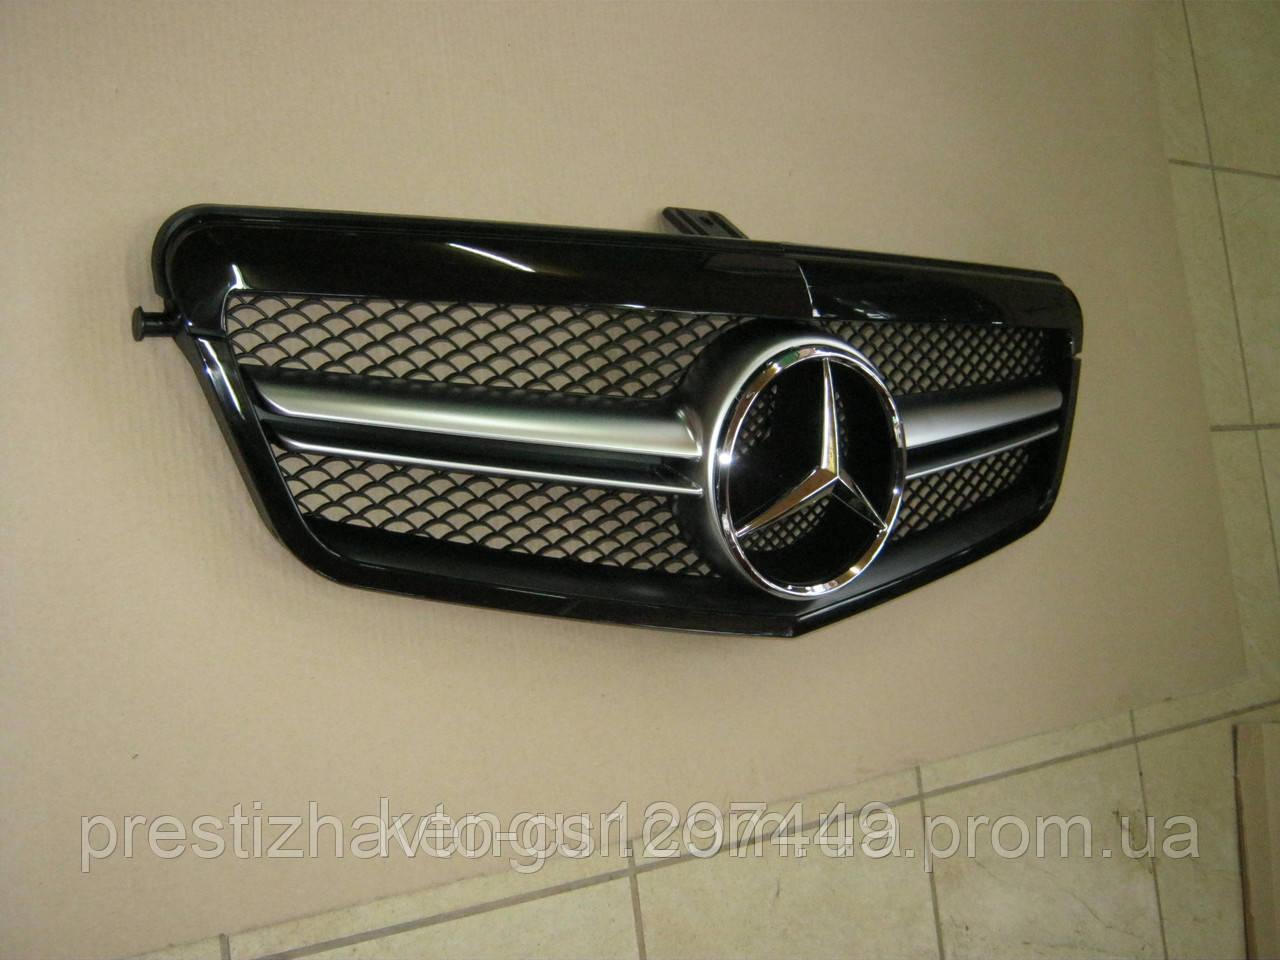 Решетка радиатора на Mercedes E-Сlass W212 (2009-2013)